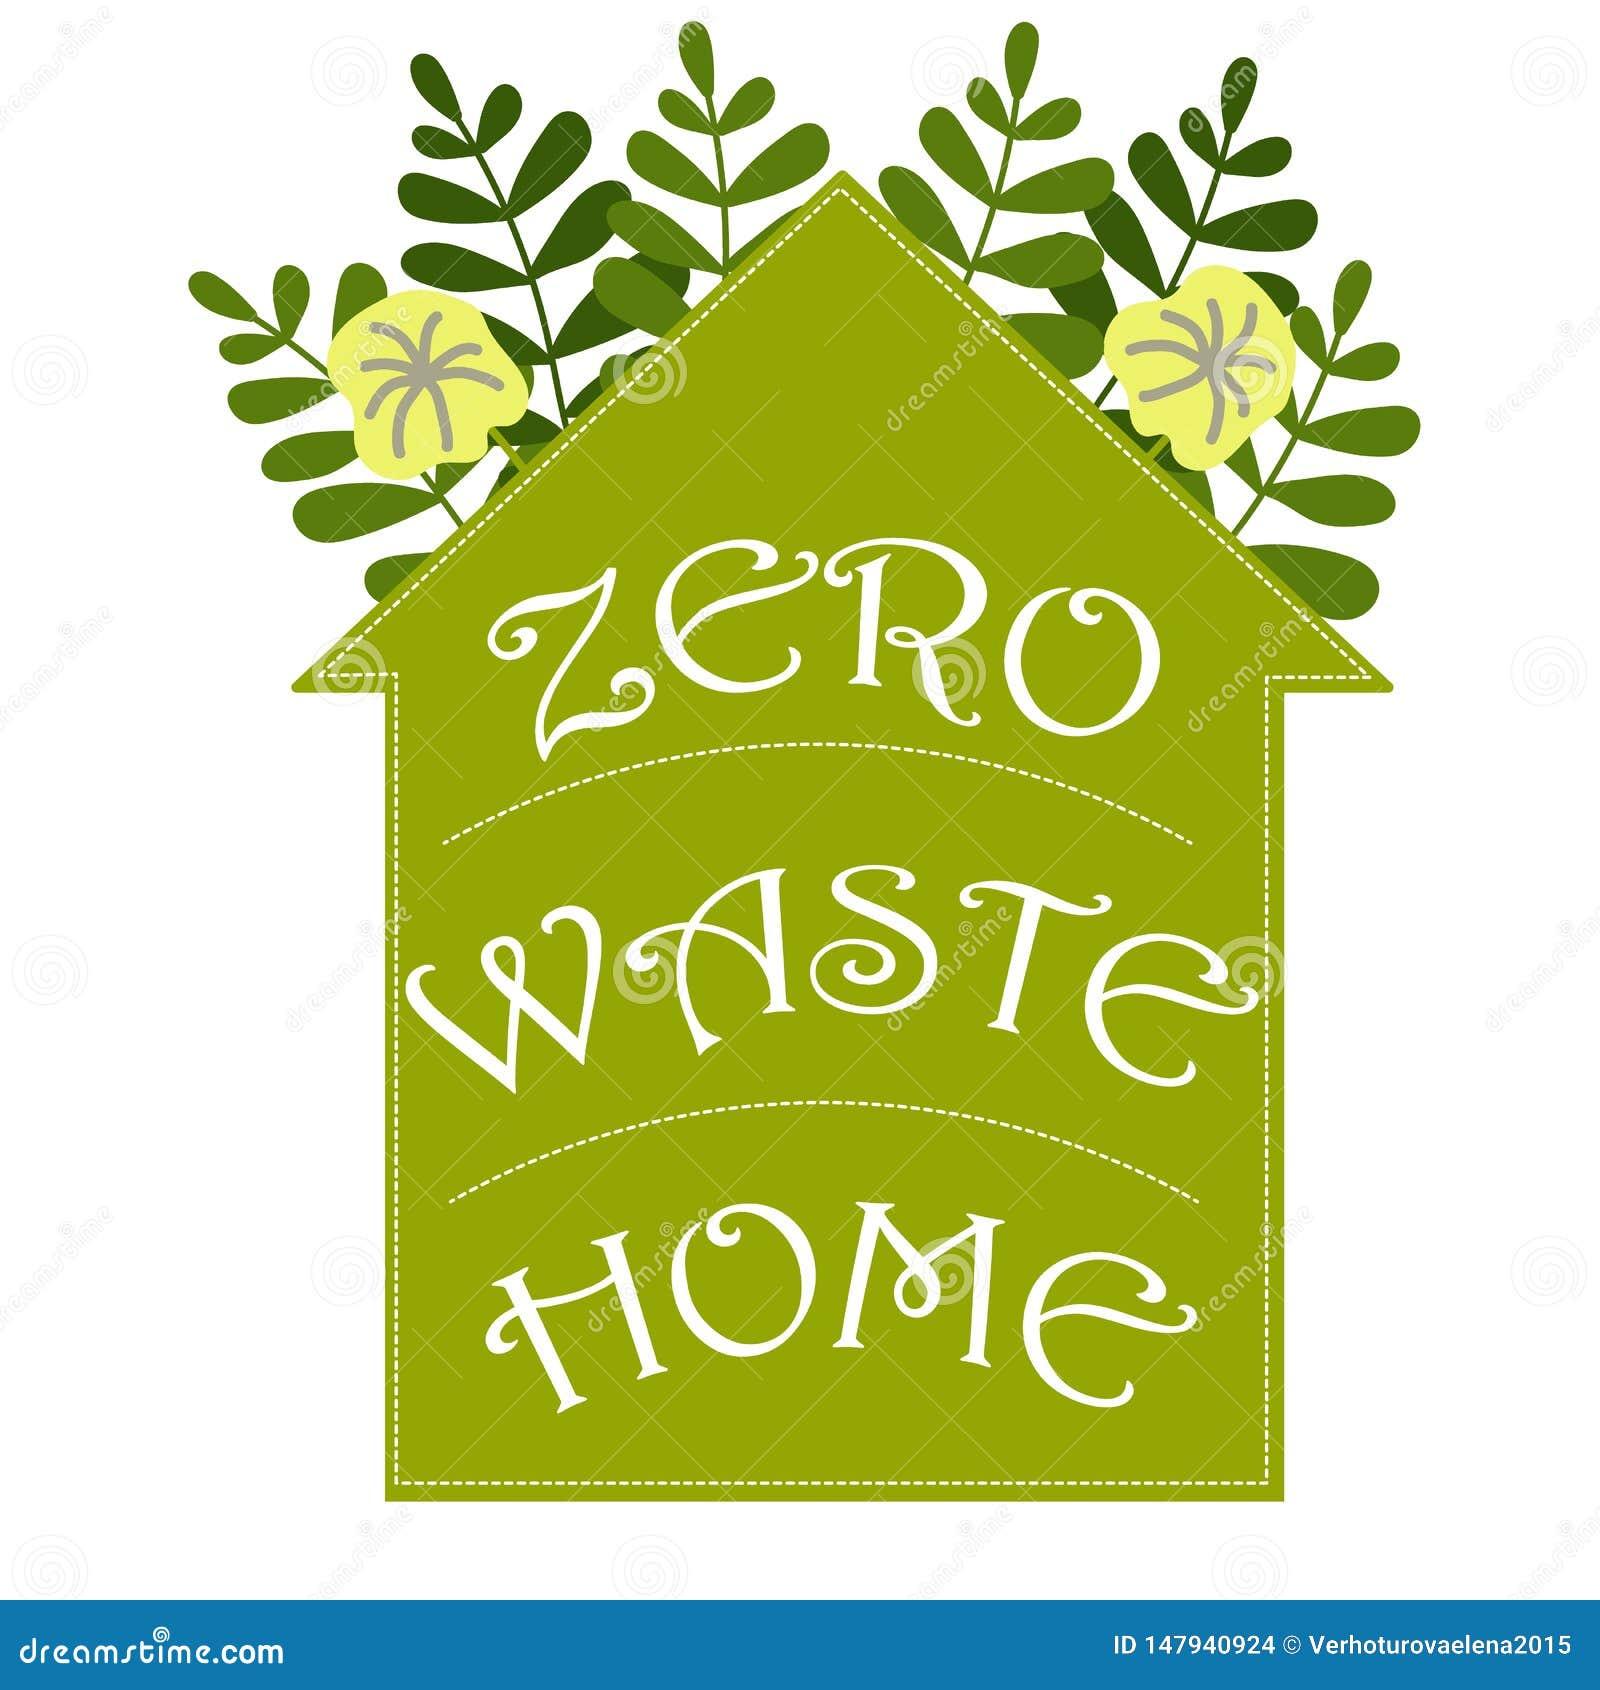 Cartoon Illustration With Zero Waste Home Vector